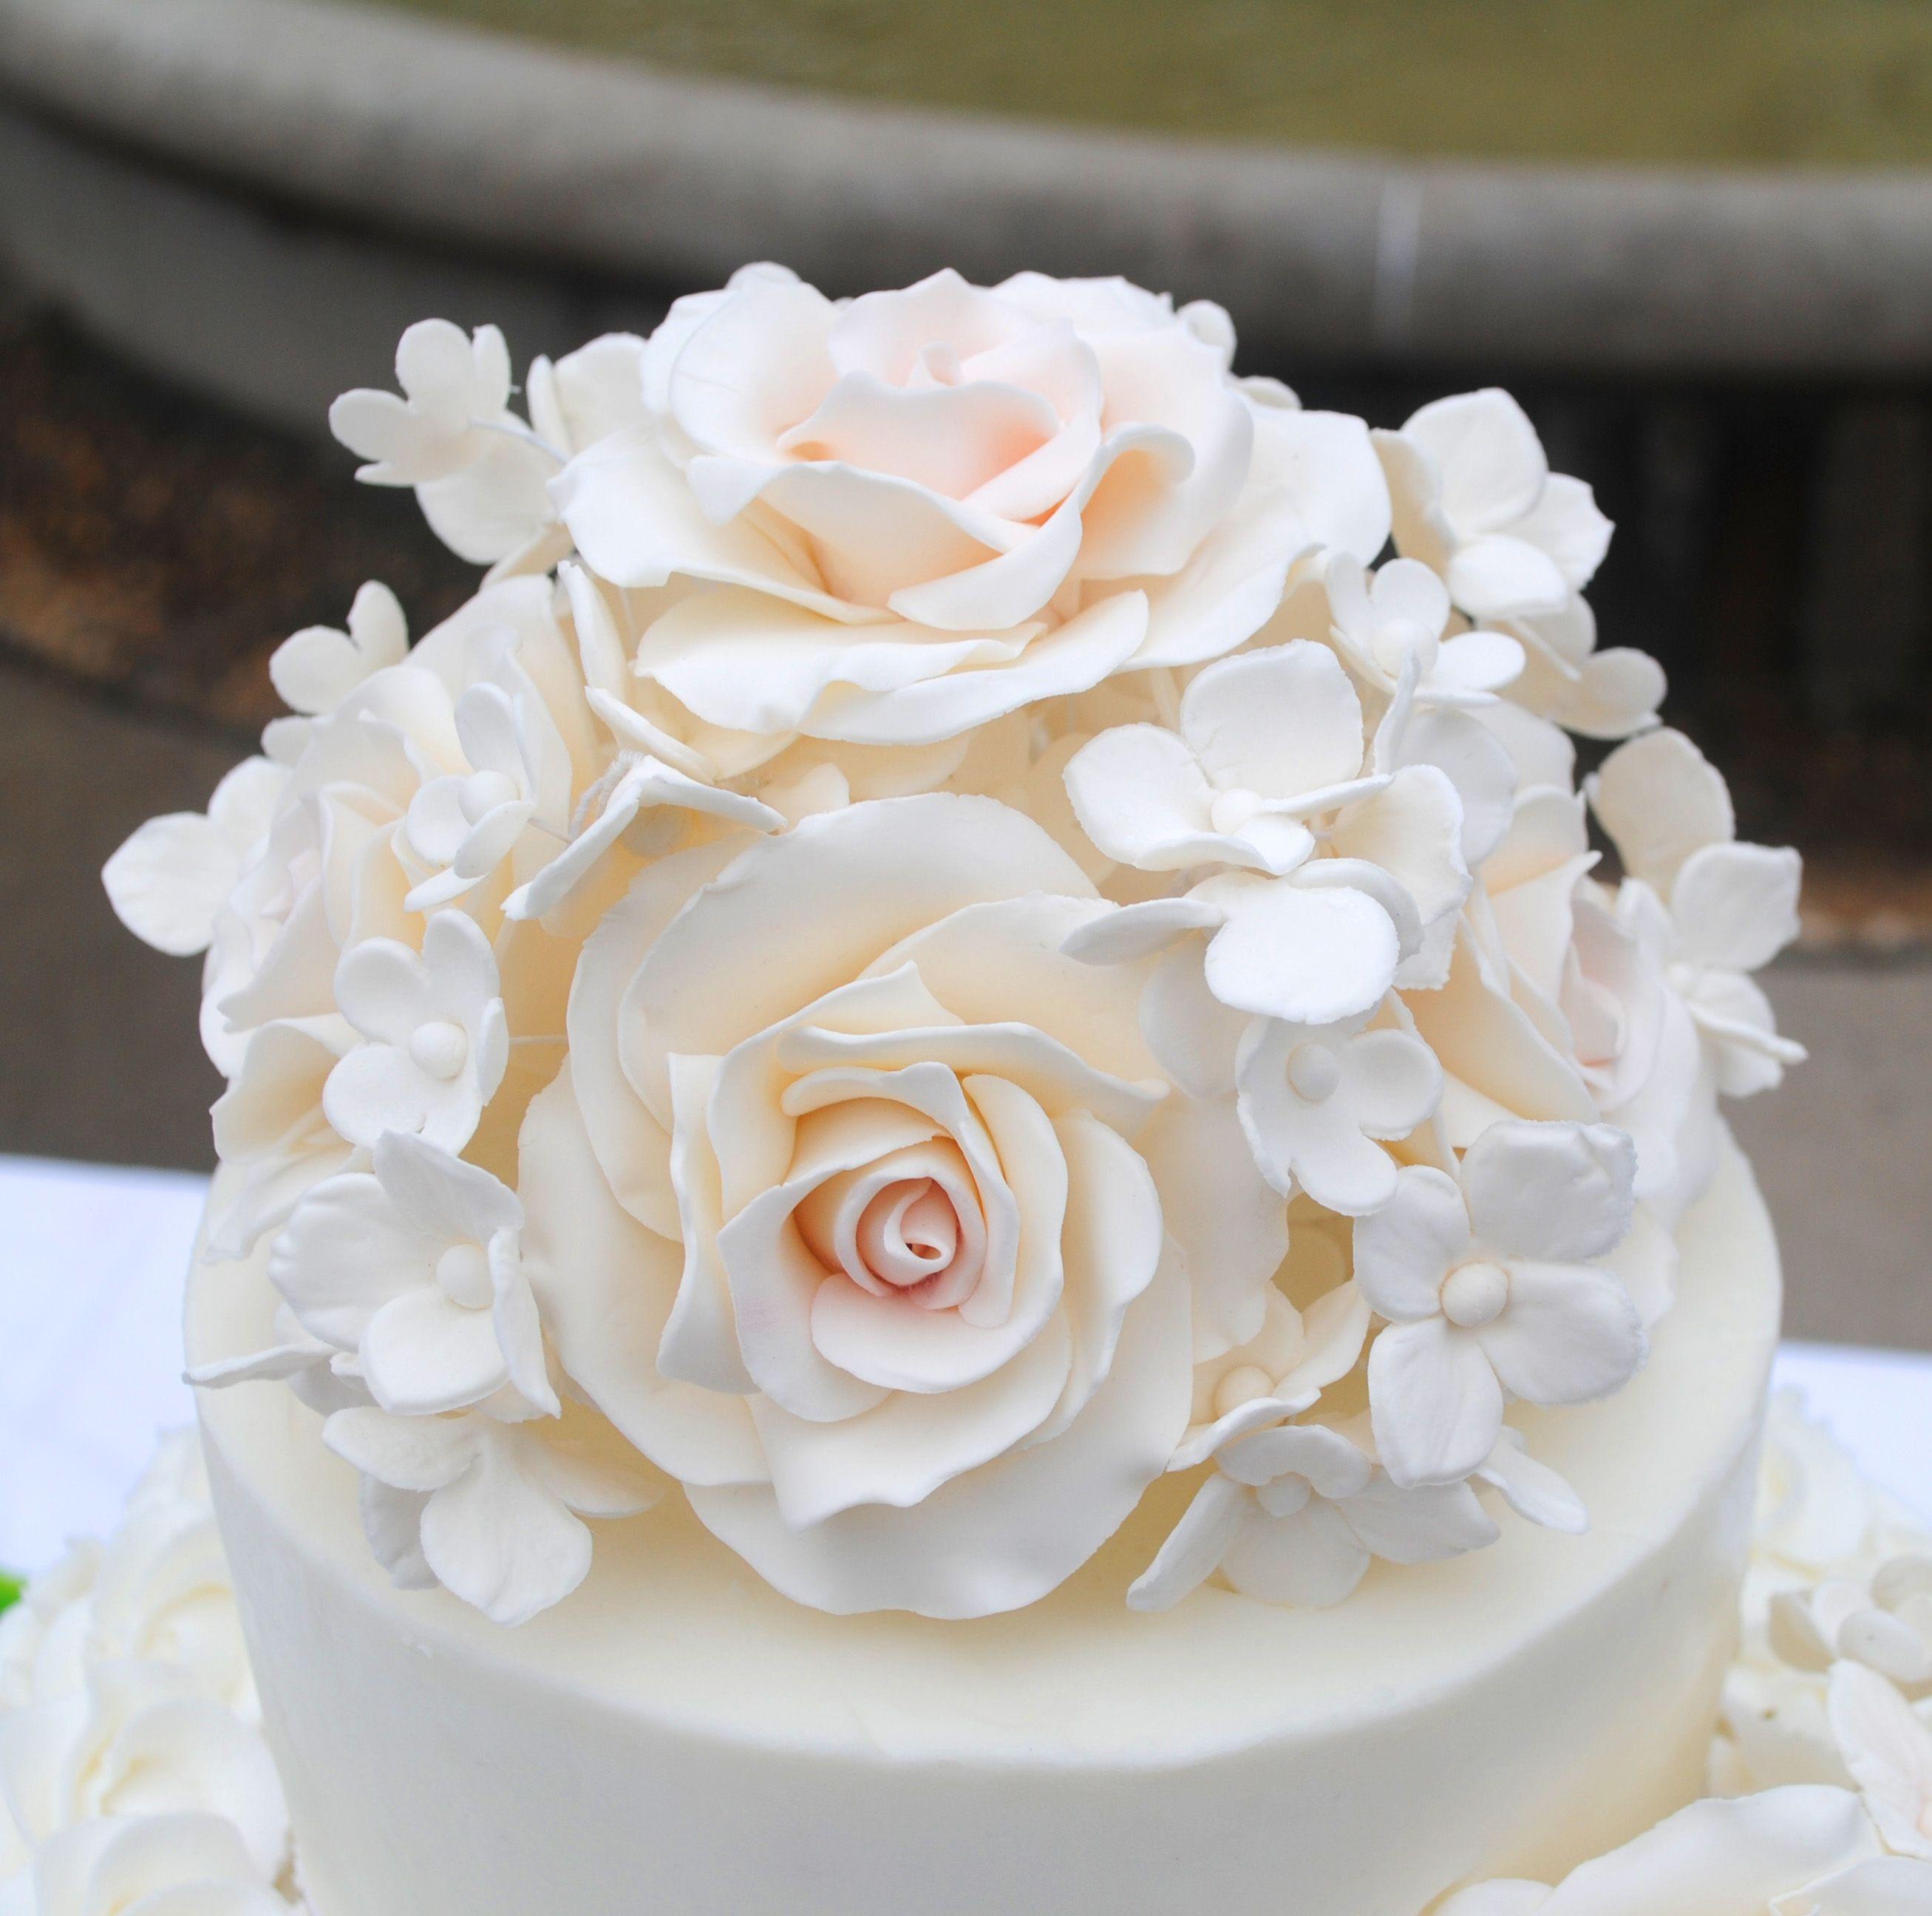 Light Pink Sugar Flowers Cake Topper Sugar Roses Sugar Hydrangeas Floral Cake Topper Floral Wedding Cake Toppers Simple Wedding Cake